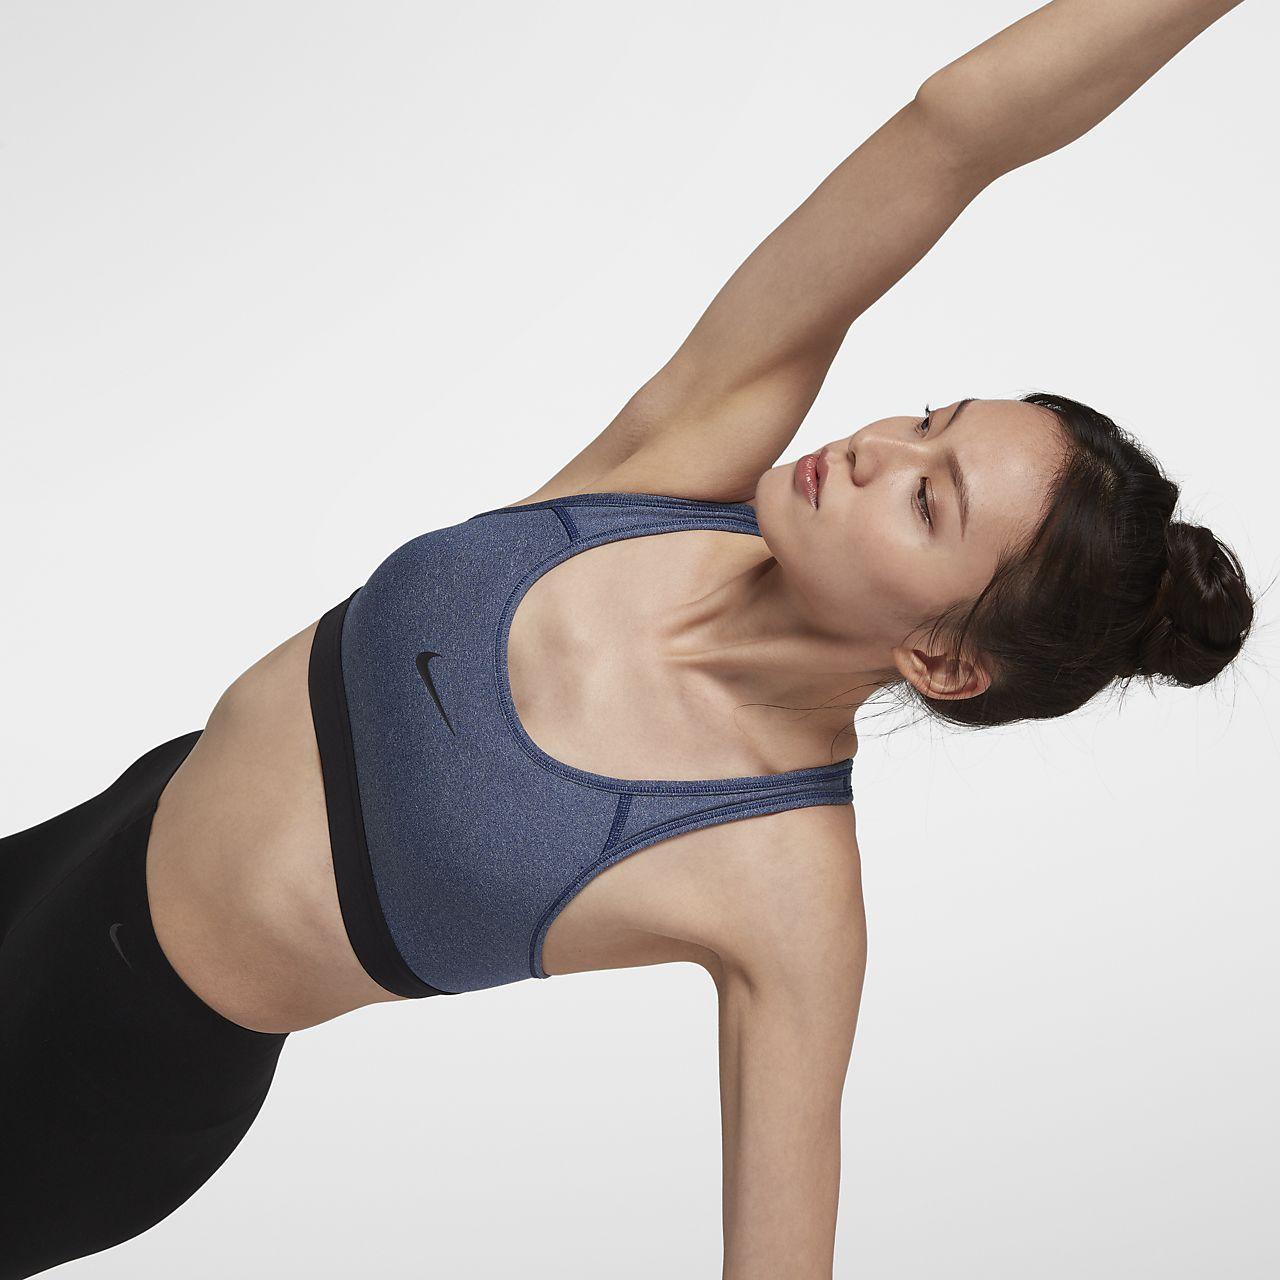 Nike Classic Padded 女子中强度支撑运动内衣